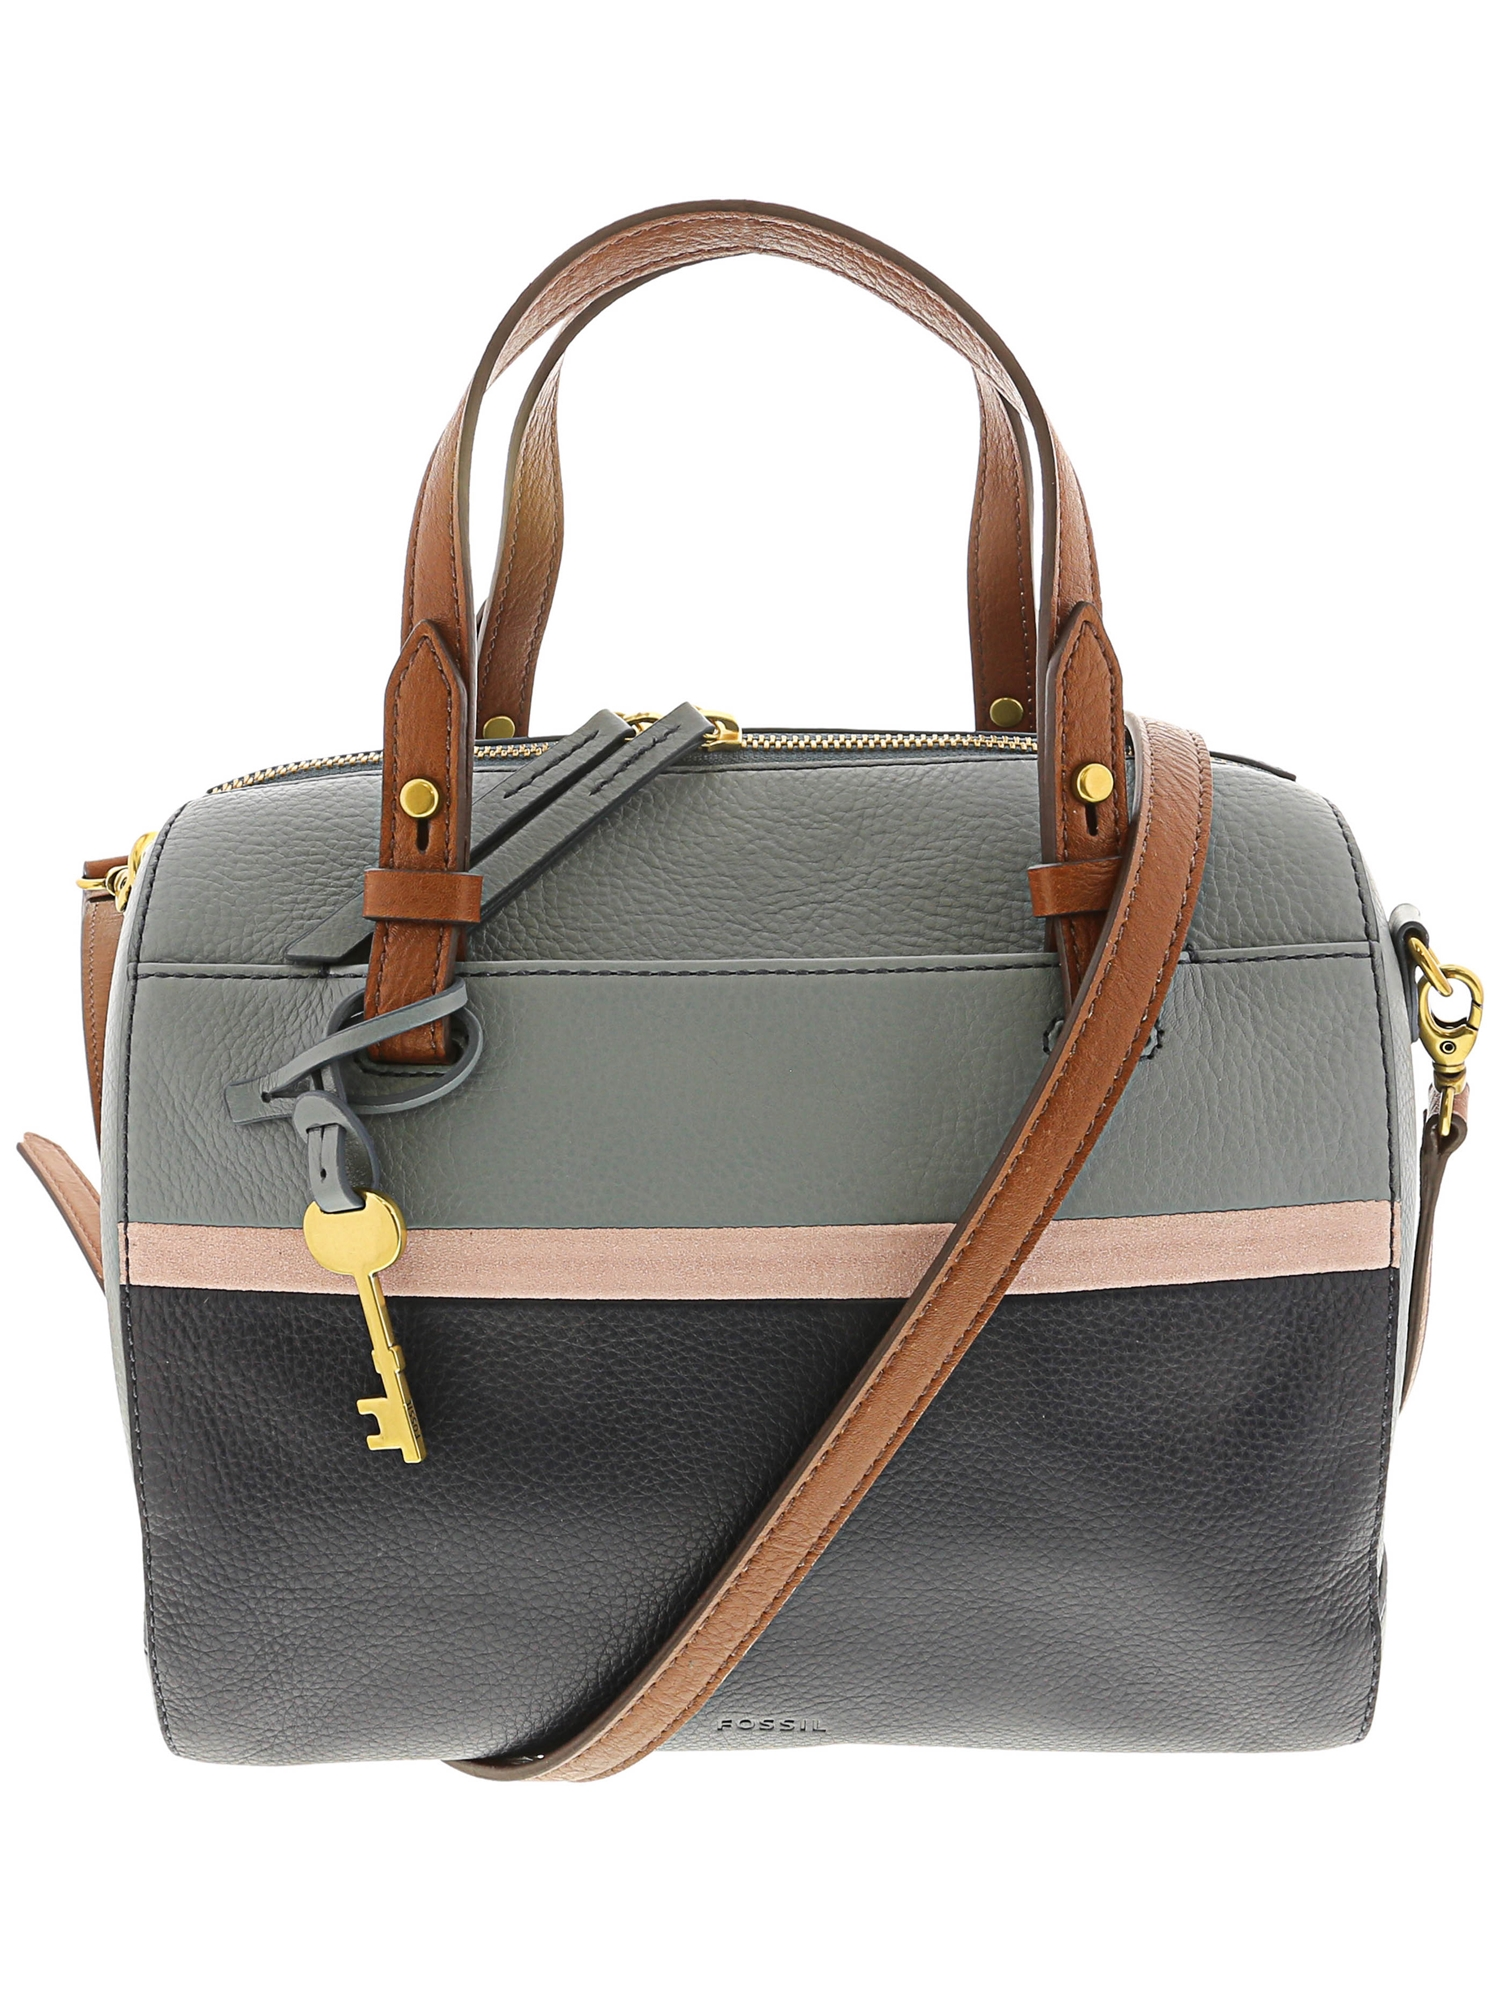 848a57fdd Fossil - Fossil Women's Rachel Leather Top-Handle Bag Satchel - Black -  Walmart.com